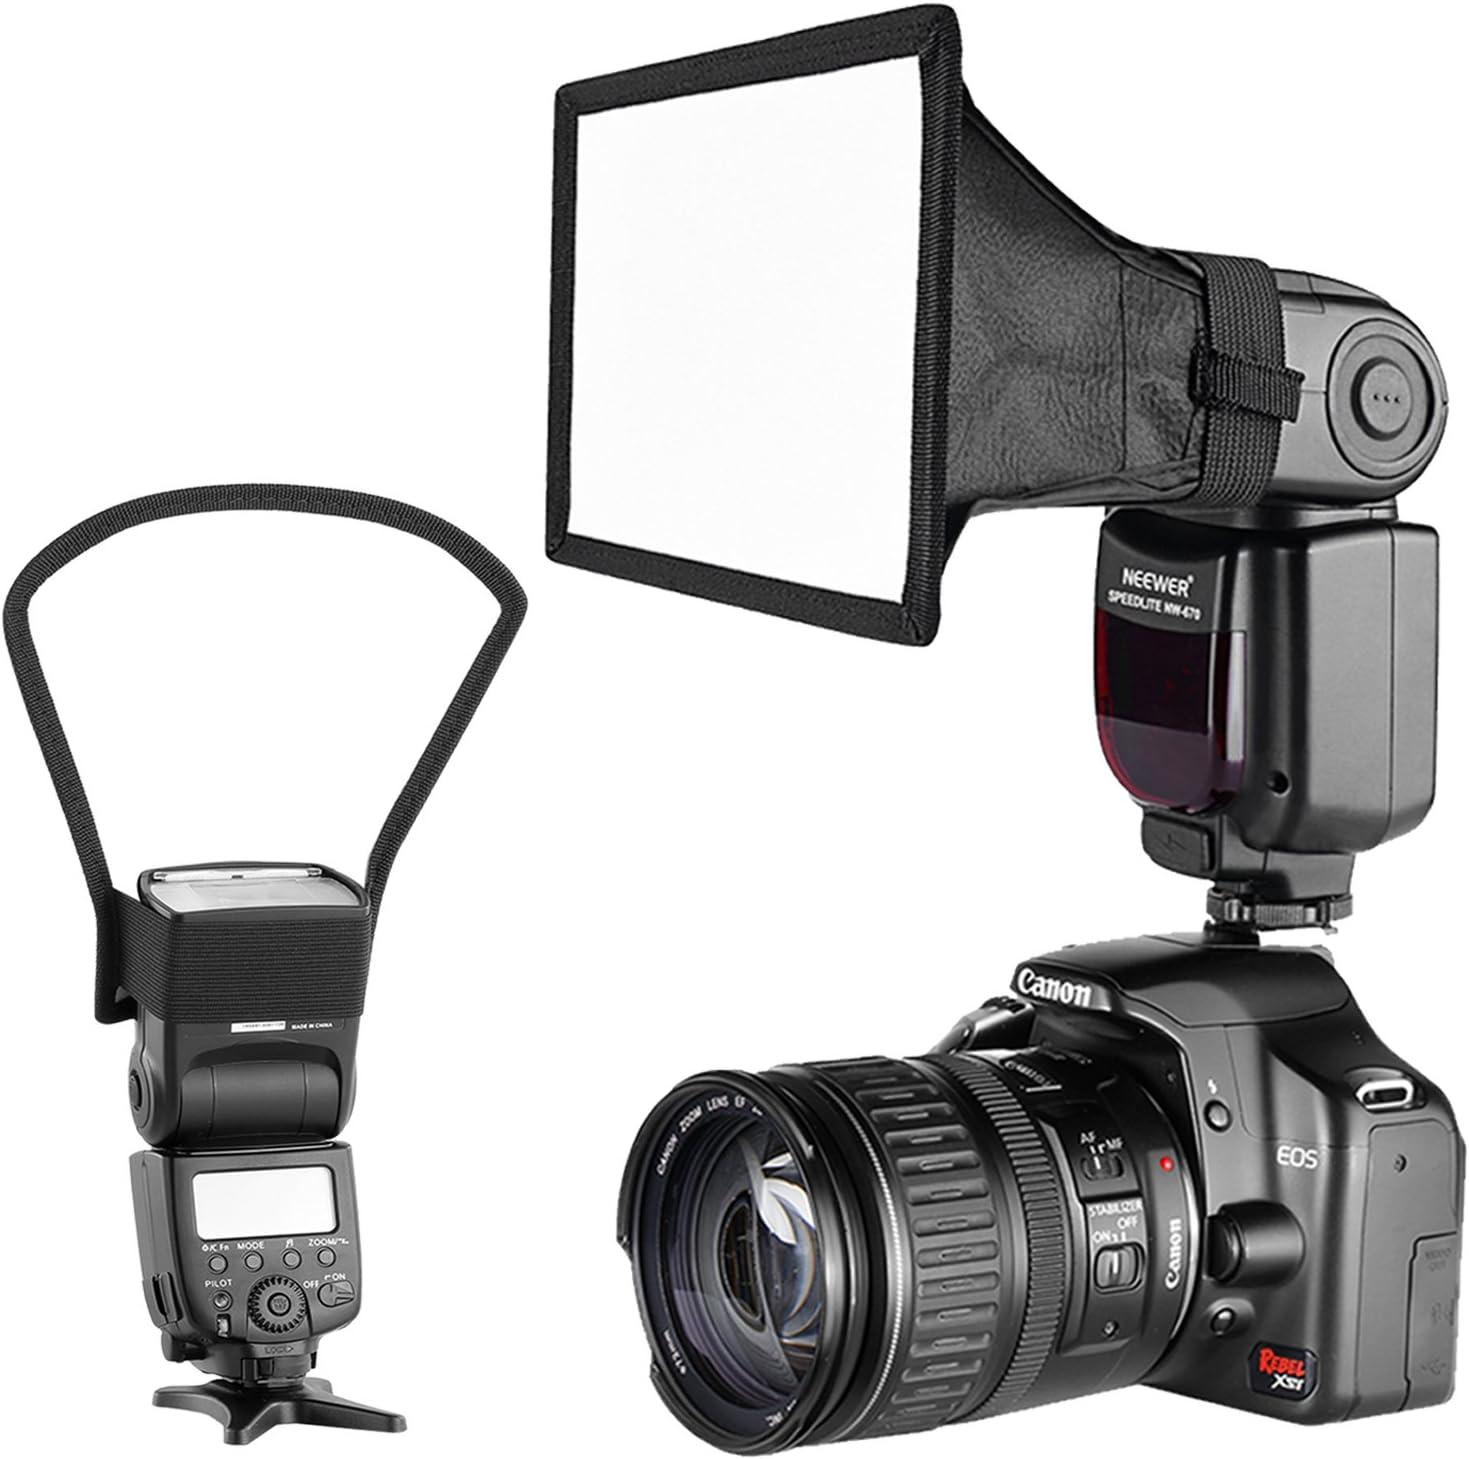 Neewer Cámara Kit de Speedlite Flash Softbox Caja de Luz y Reflector Difusor para Canon Nikon y Otras Cámaras DSLR Flashes, Neewer TT560 TT850 TT860 NW561 NW670 VK750II Flashes: Amazon.es: Electrónica